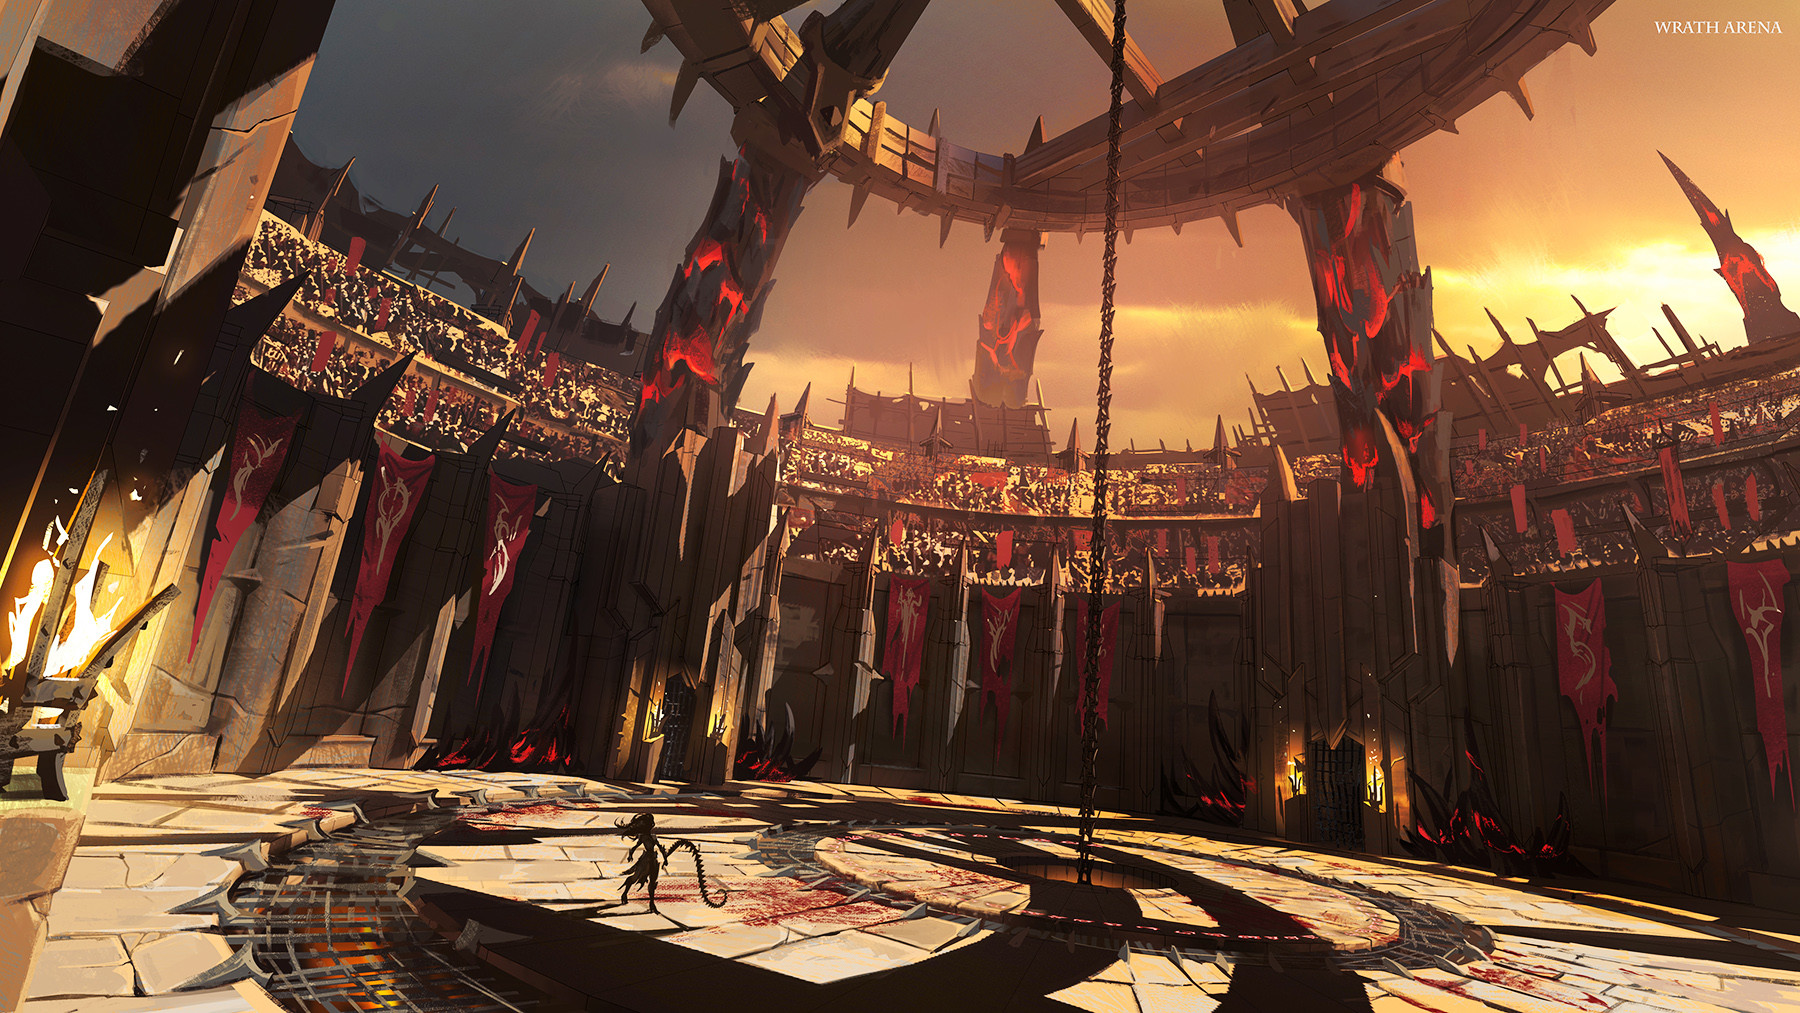 Daryl mandryk wrath arena